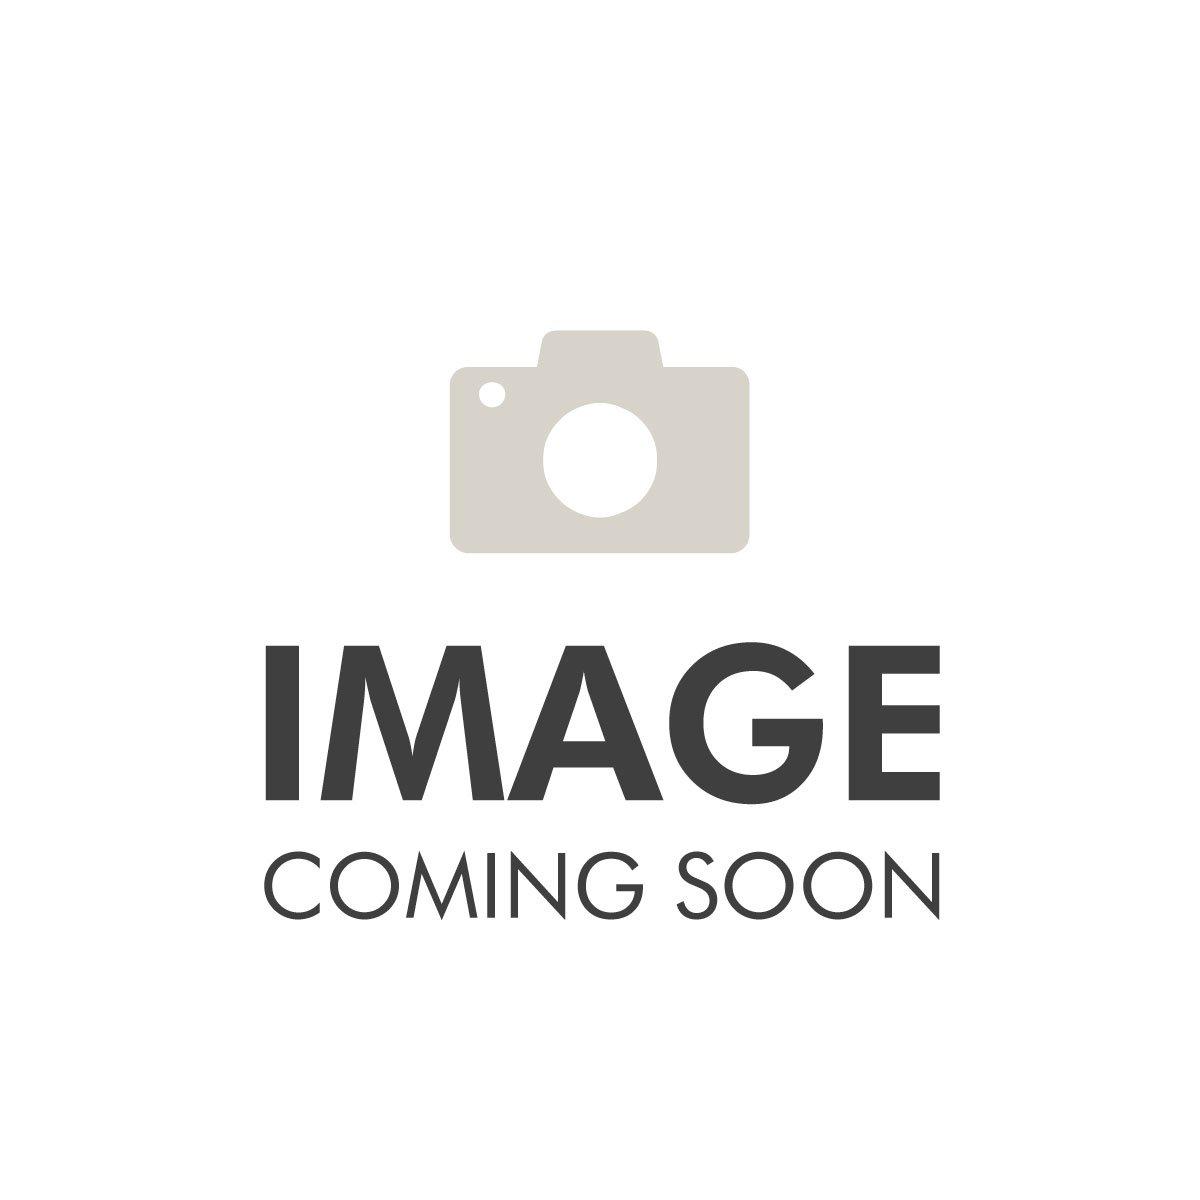 Thierry Mugler Angel Gift Set - 25ml EDP + 100ml Body Lotion + 30ml Shower Gel